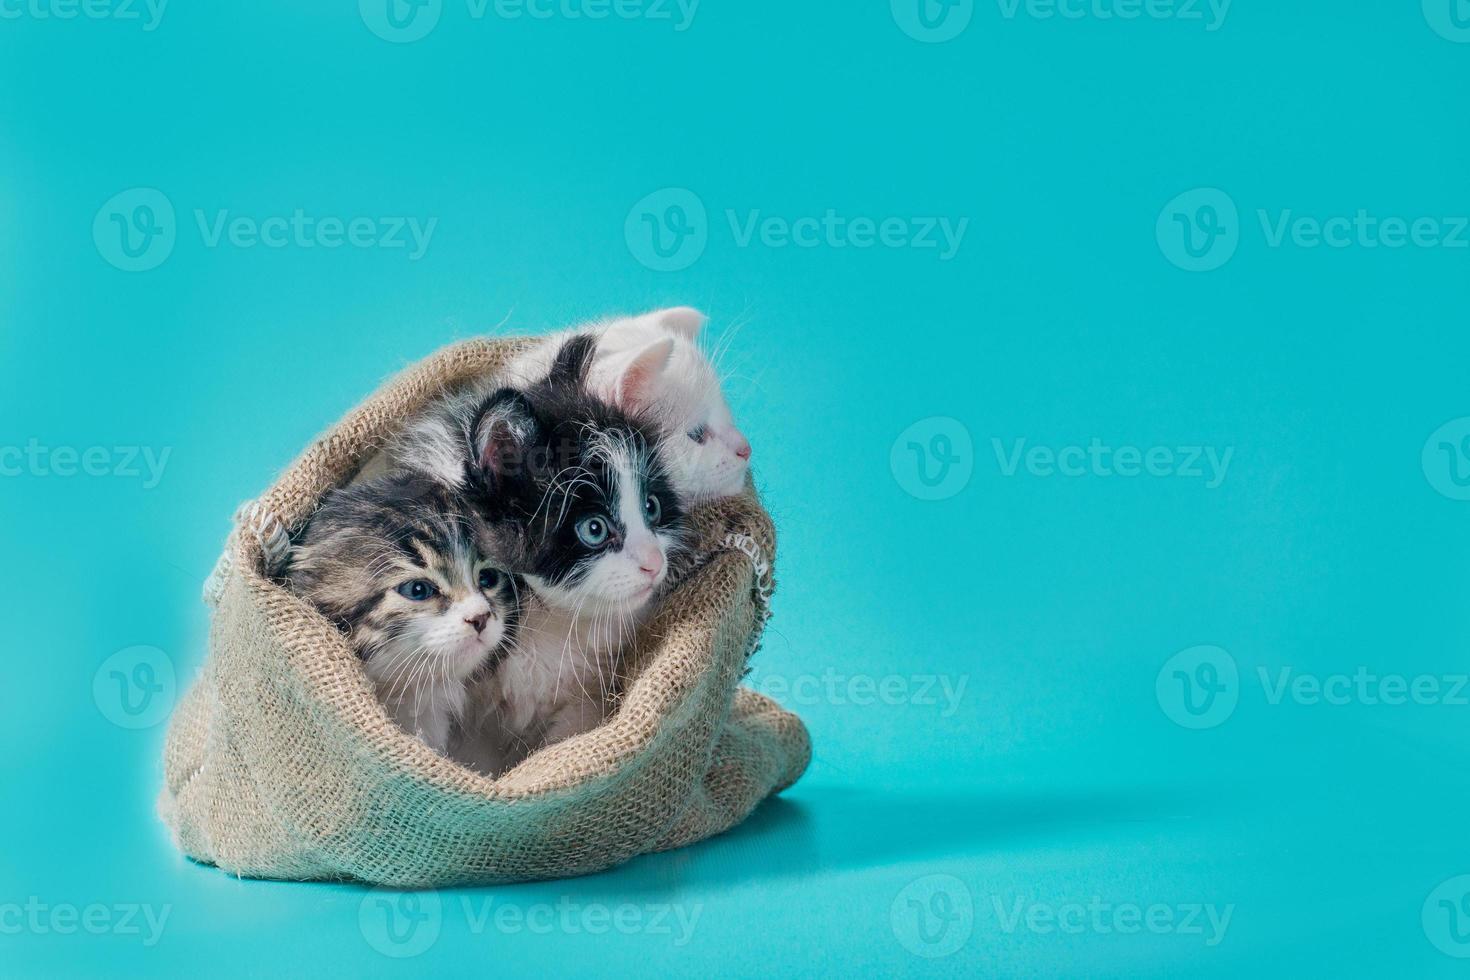 Tres gatitos en un saco sobre un fondo turquesa foto